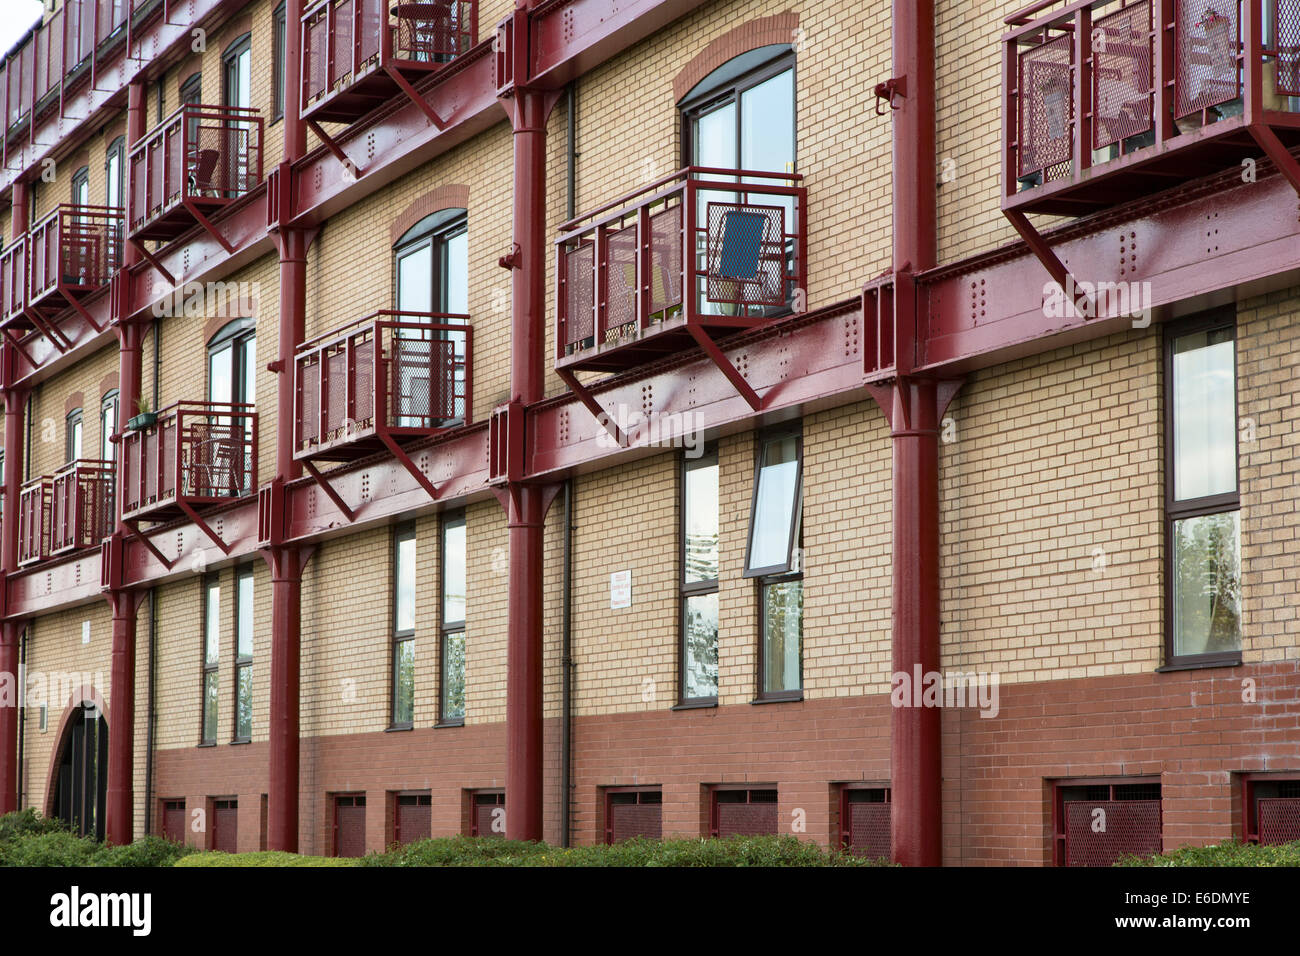 Dockside development, Preston - Stock Image